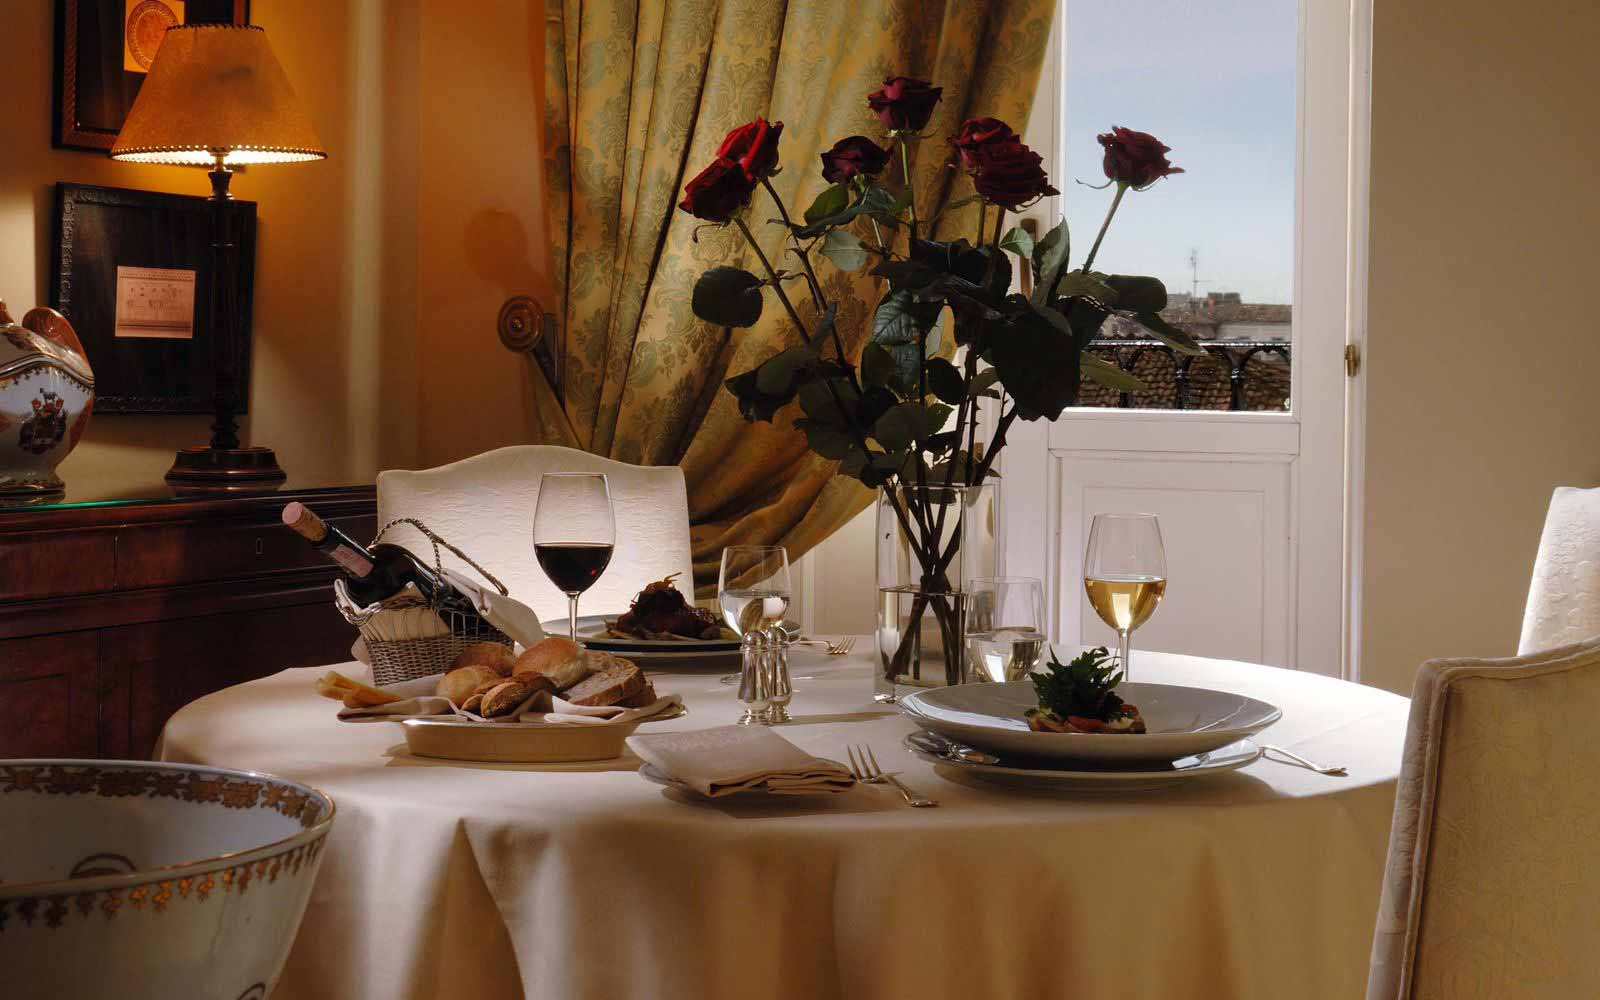 Room service at Hotel Eden